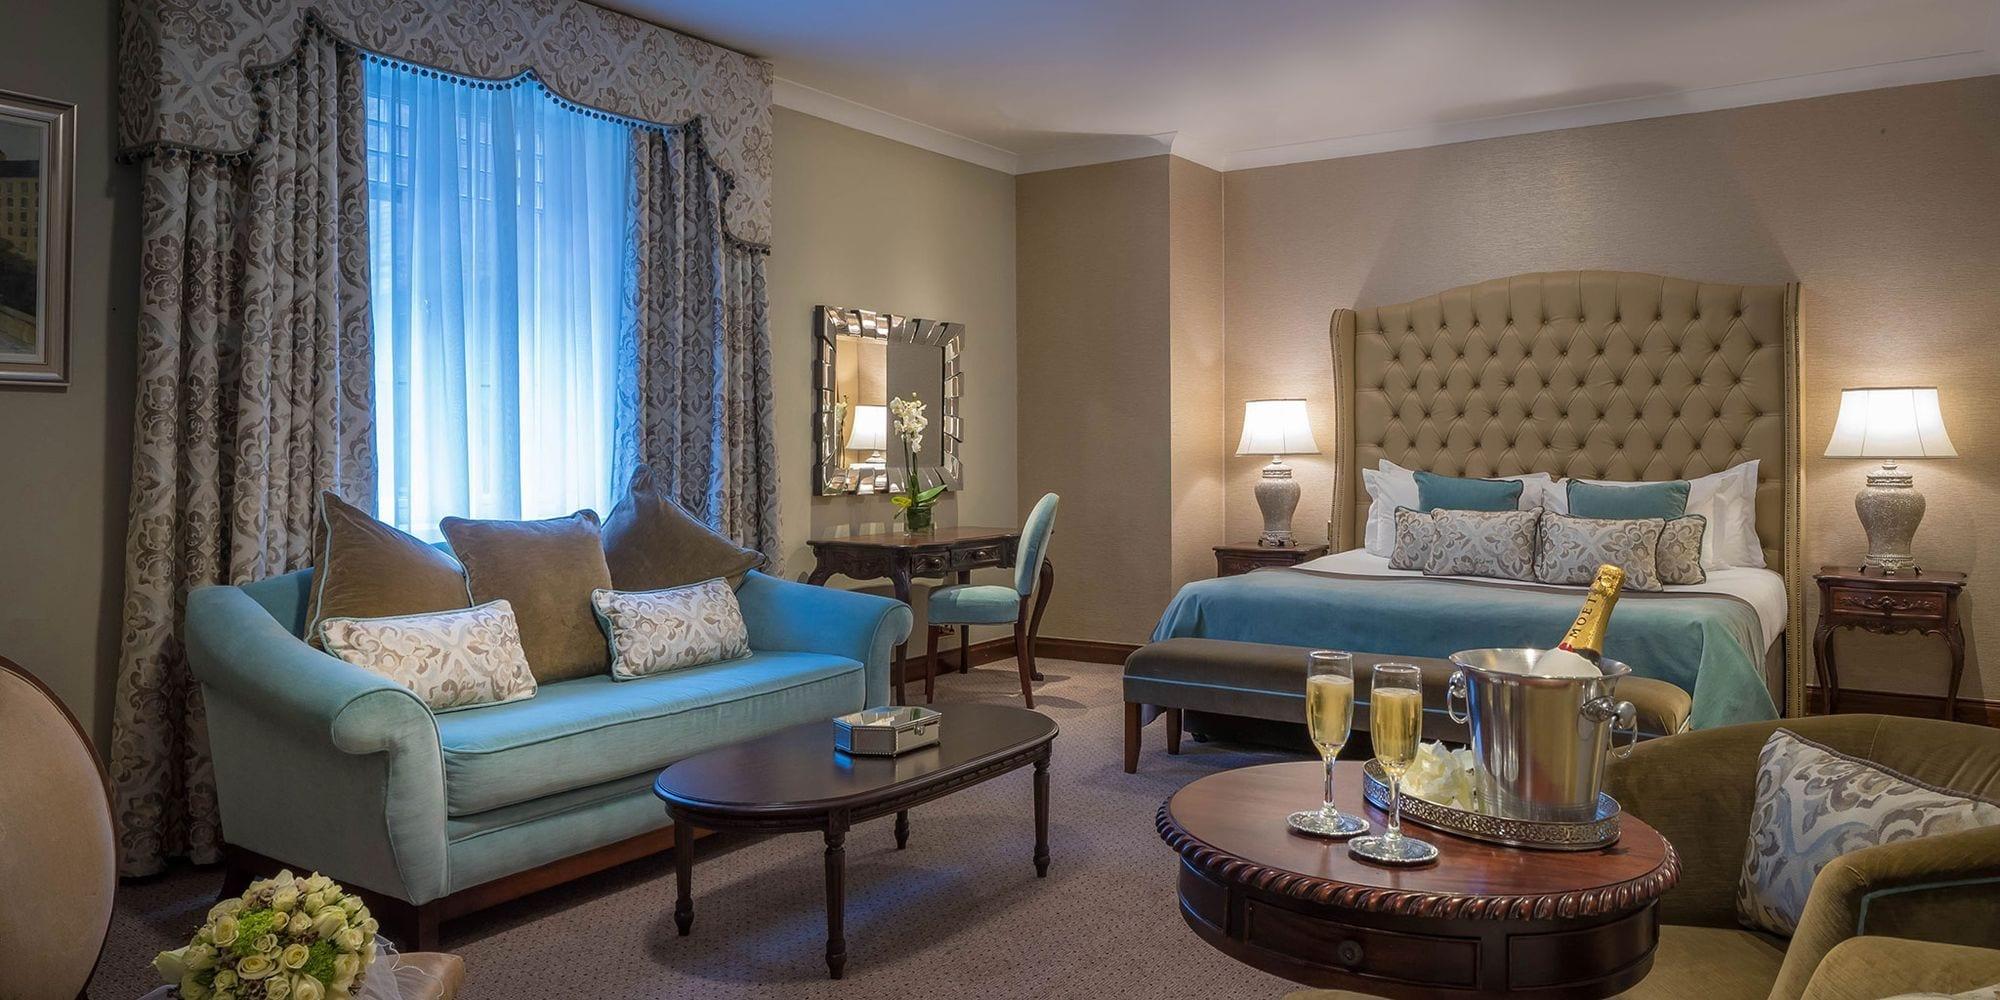 Win a stay at Clayton Hotel, Ballsbridge